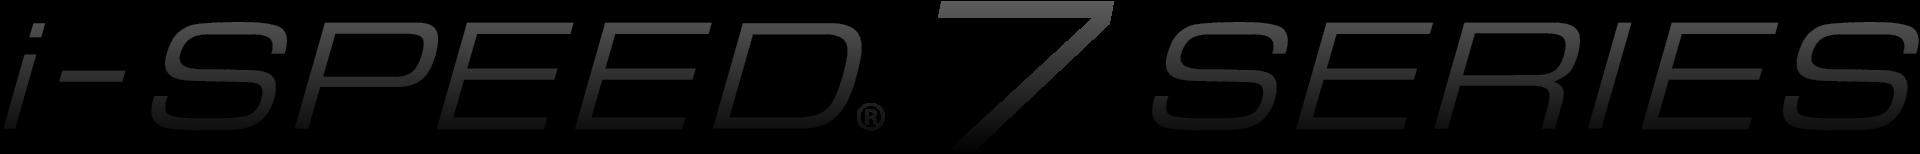 i-SPEED 7 Series logo.